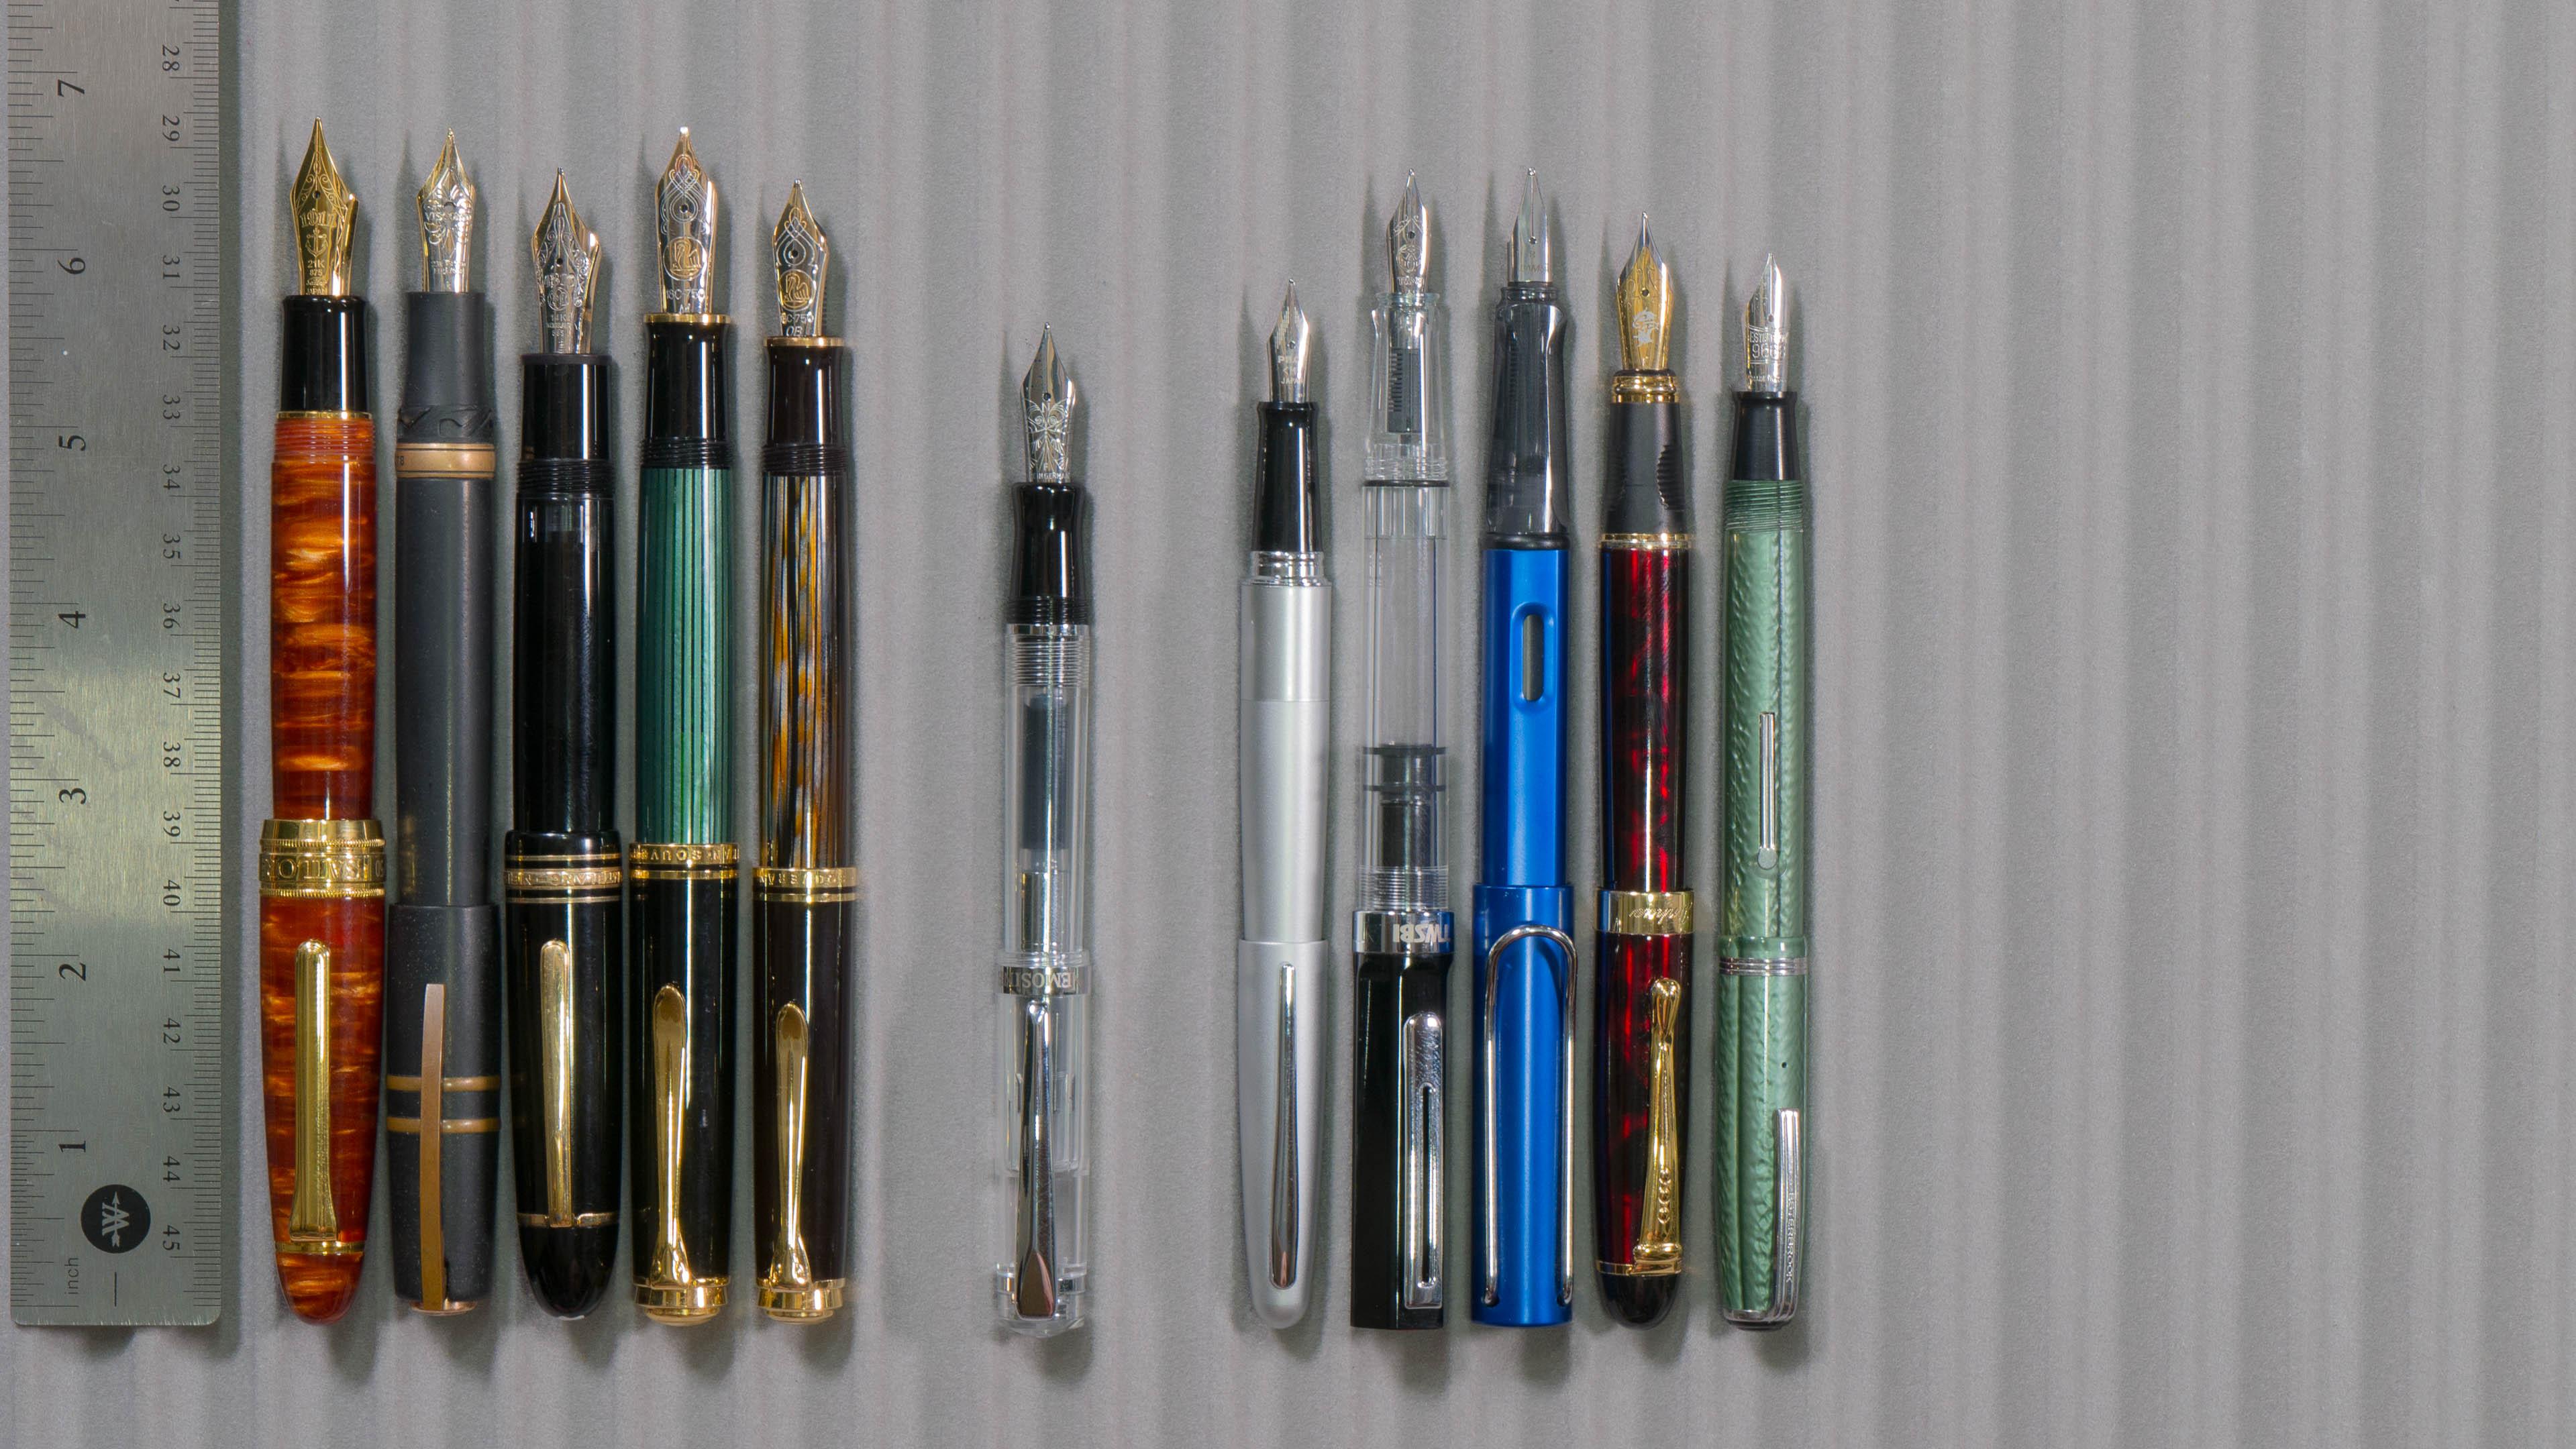 Nemosine Singularity Fountain Pens - PenChalet